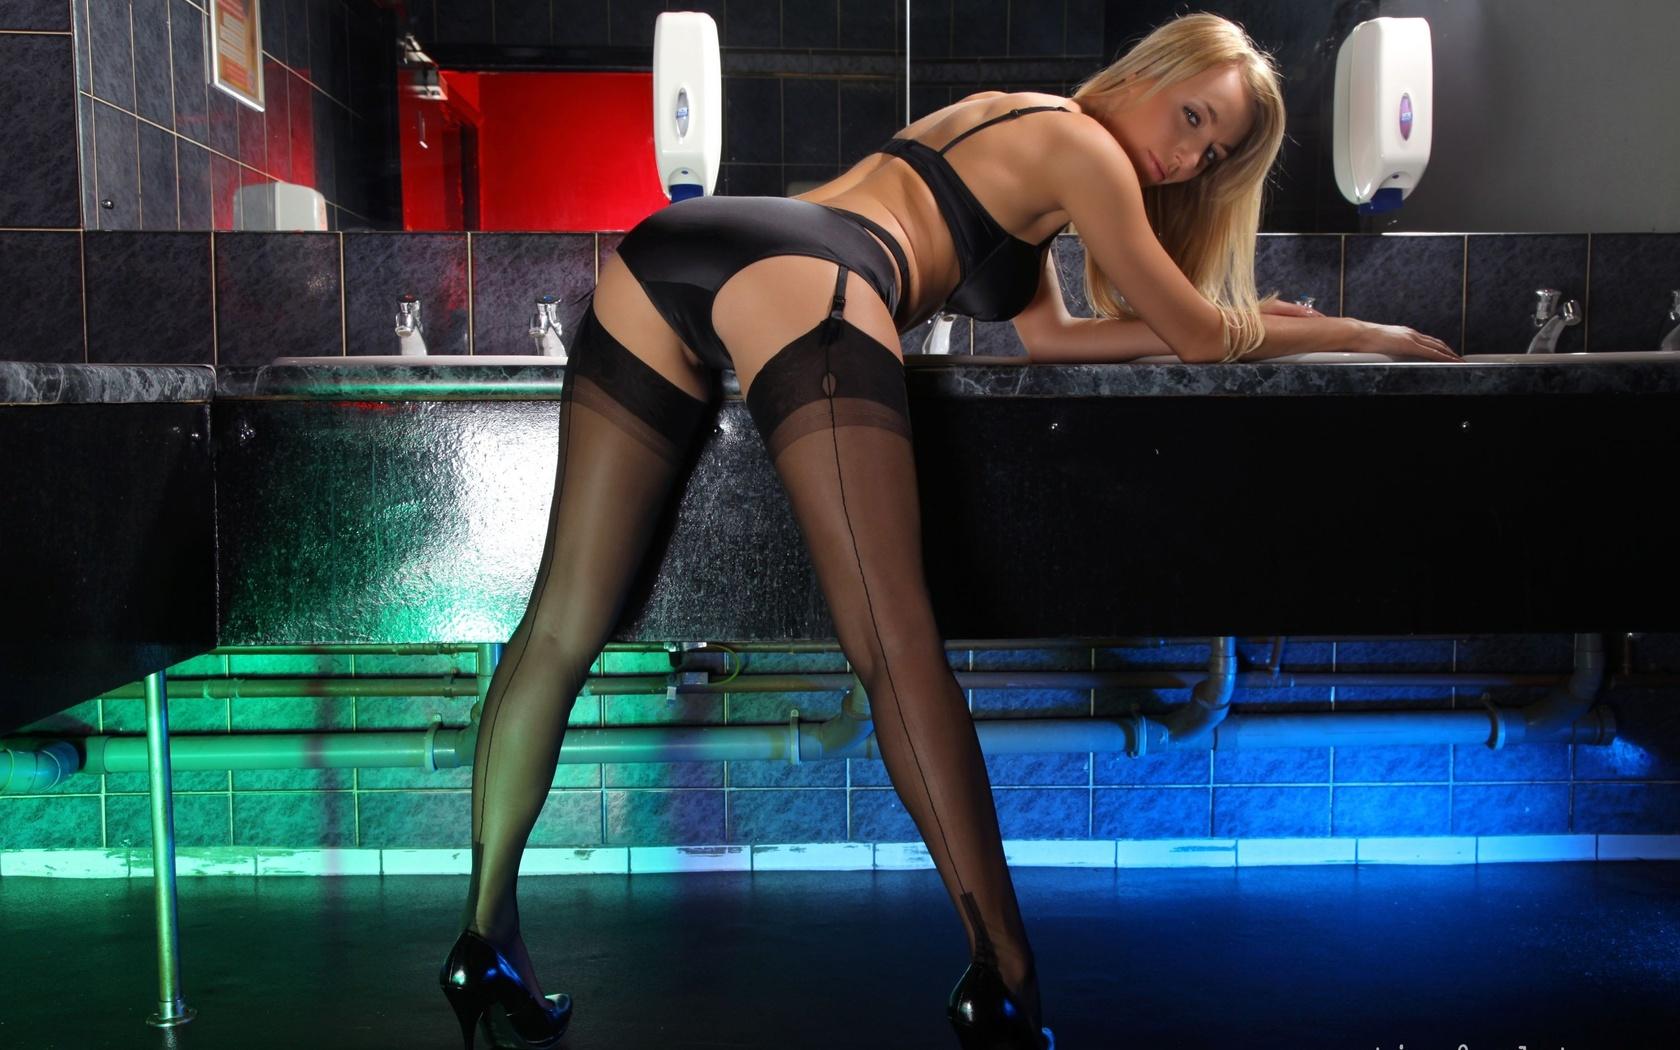 women, model, blonde, high heels, stockings, mirror, gray eyes, lingerie, black bras, black stockings, clothing, black panties, hayley marie coppin, leg, photo shoot, thigh